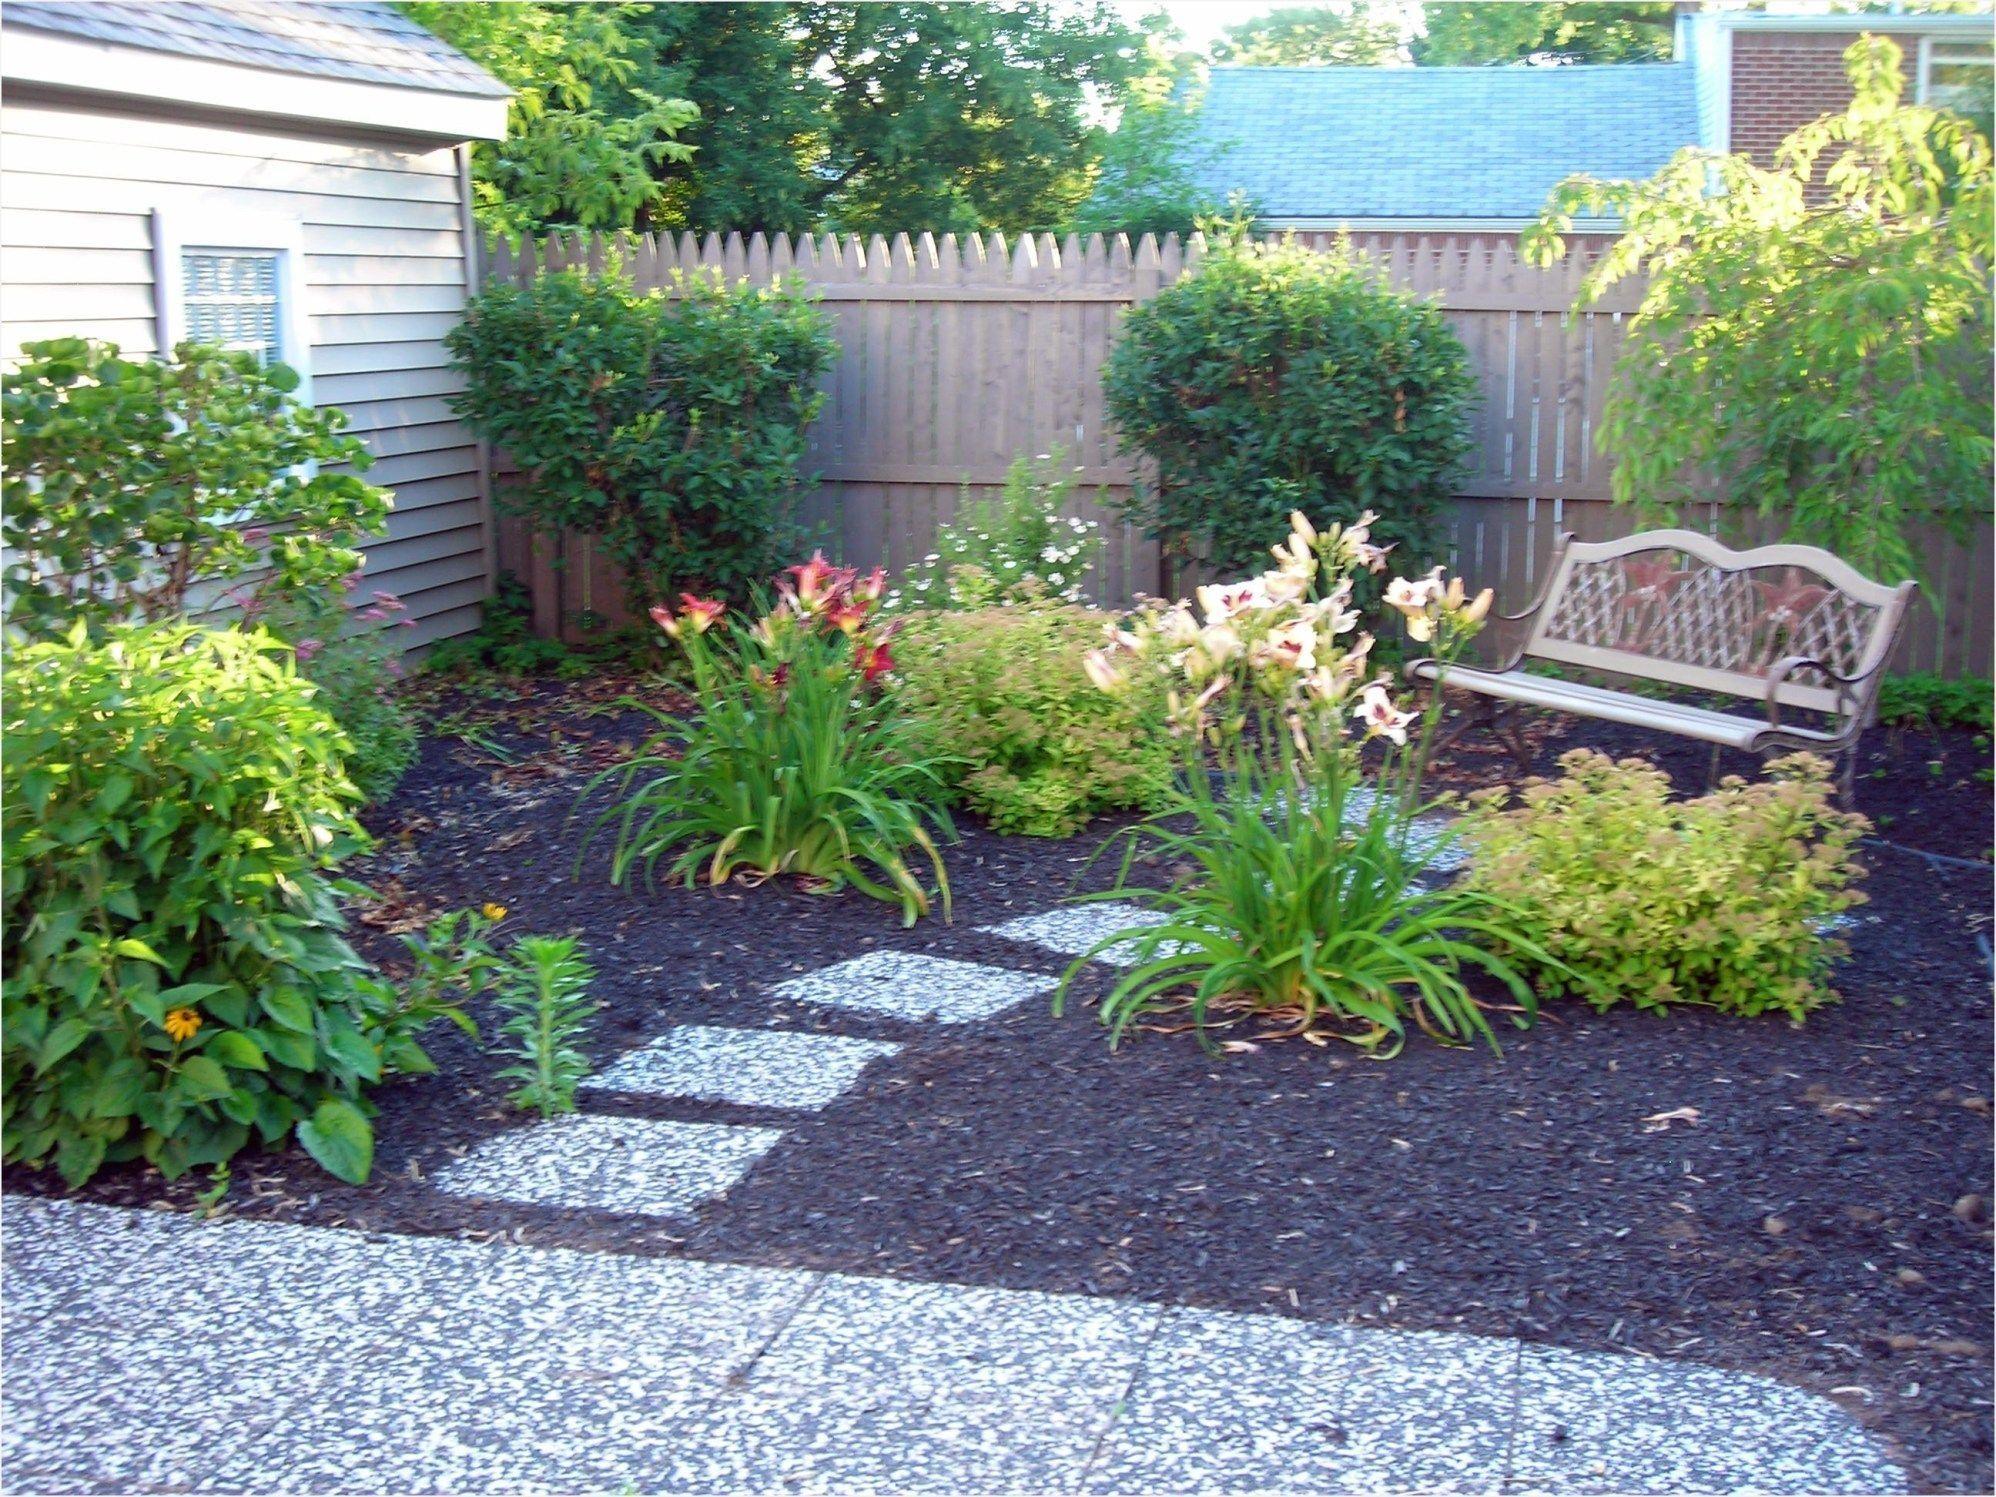 30+ Newest Green Grass Design Ideas For Front Yard Garden ...